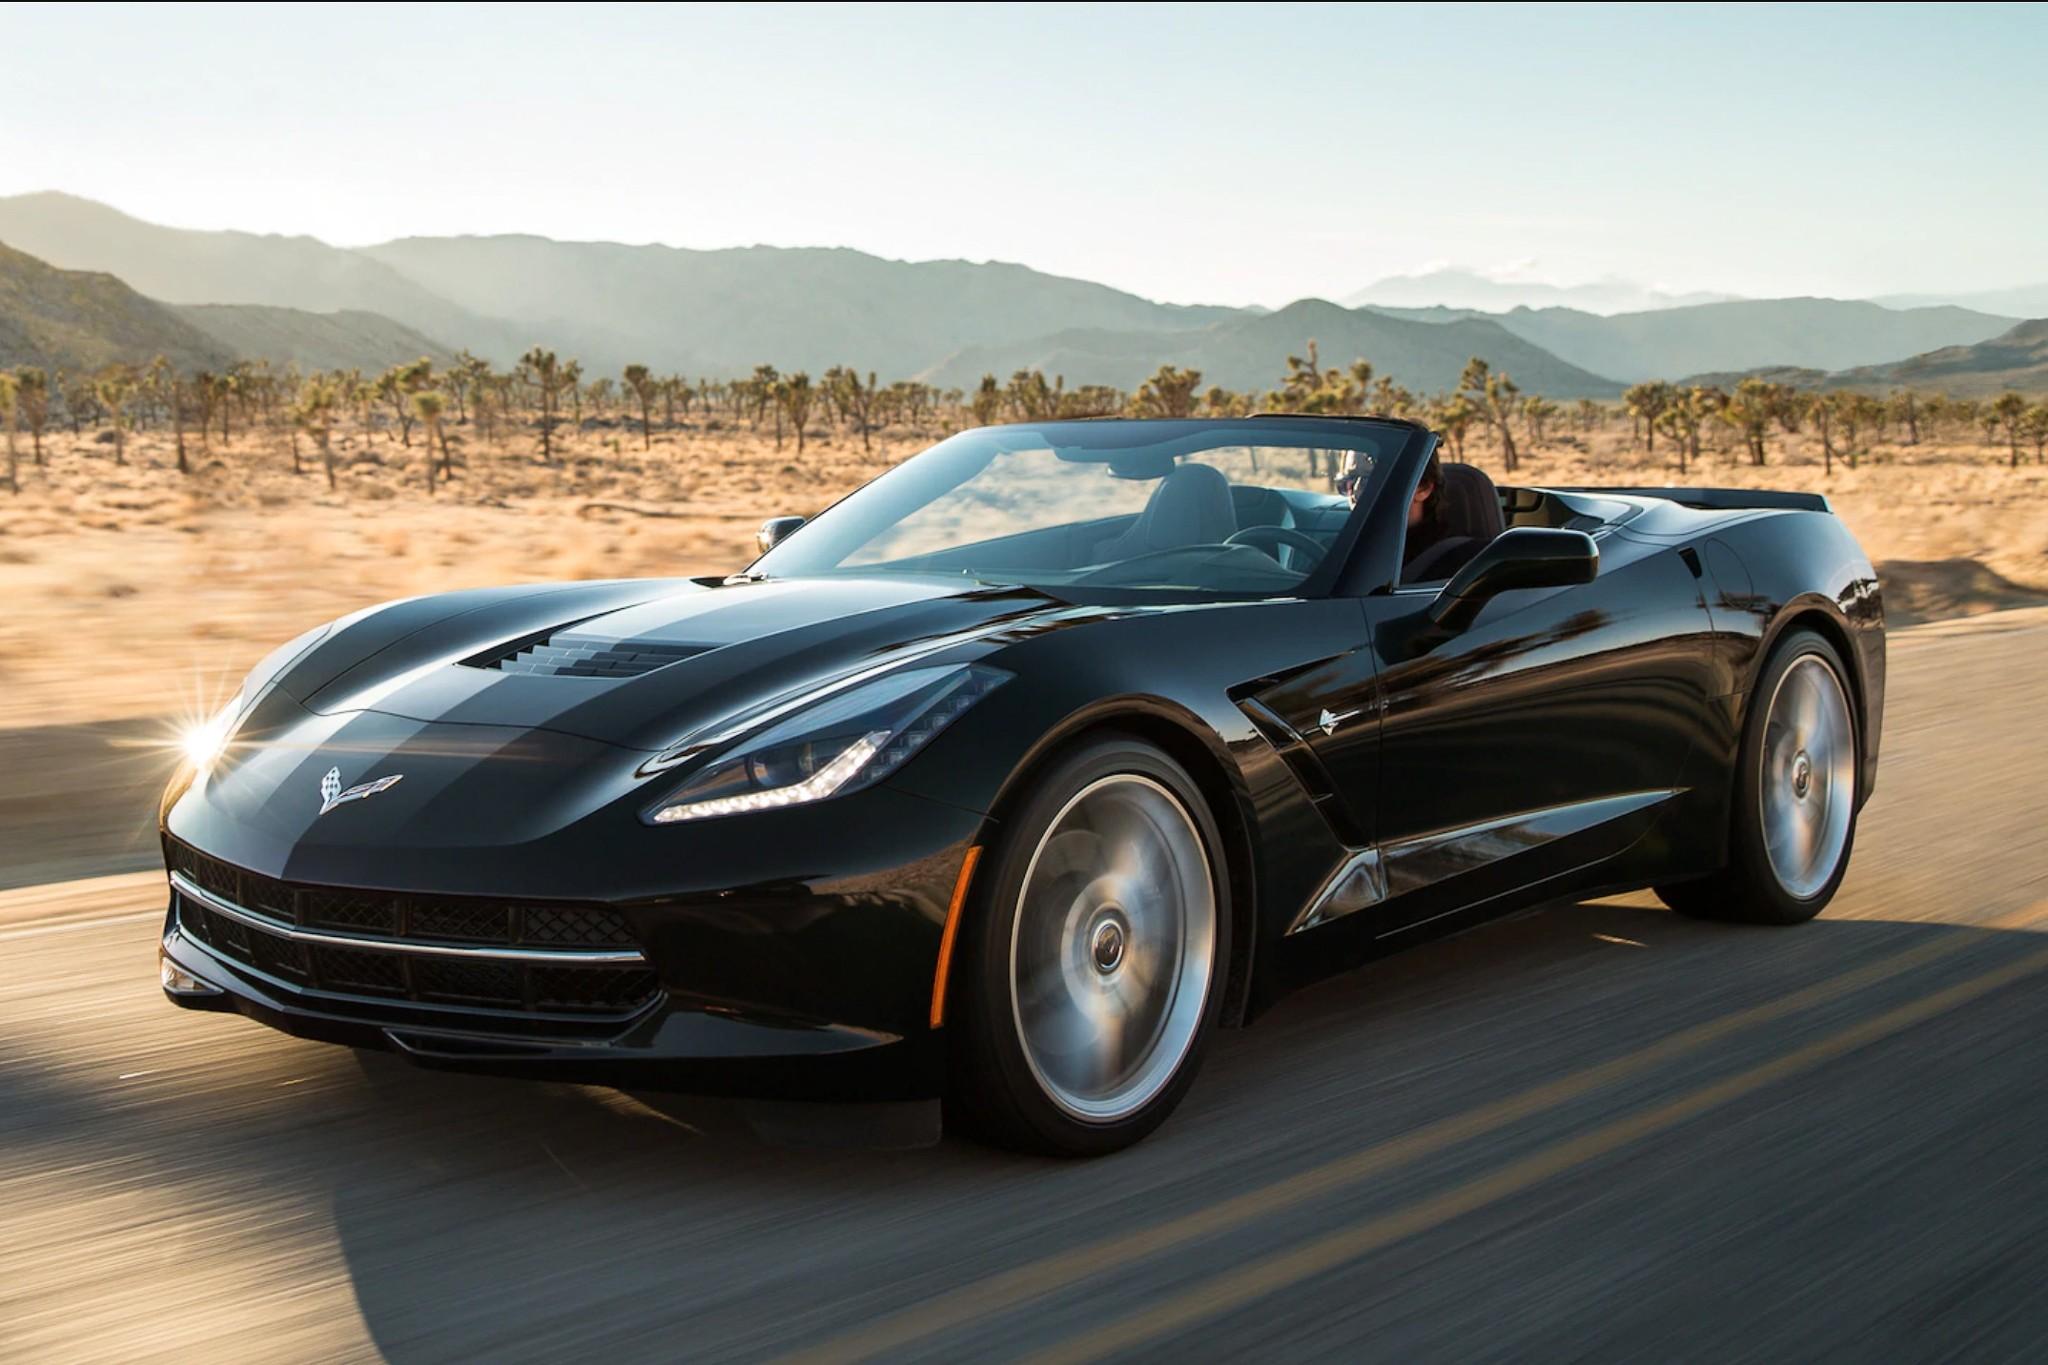 chevrolet-corvette-2019-01-angle--black--convertible--dynamic--exterior--front.jpg